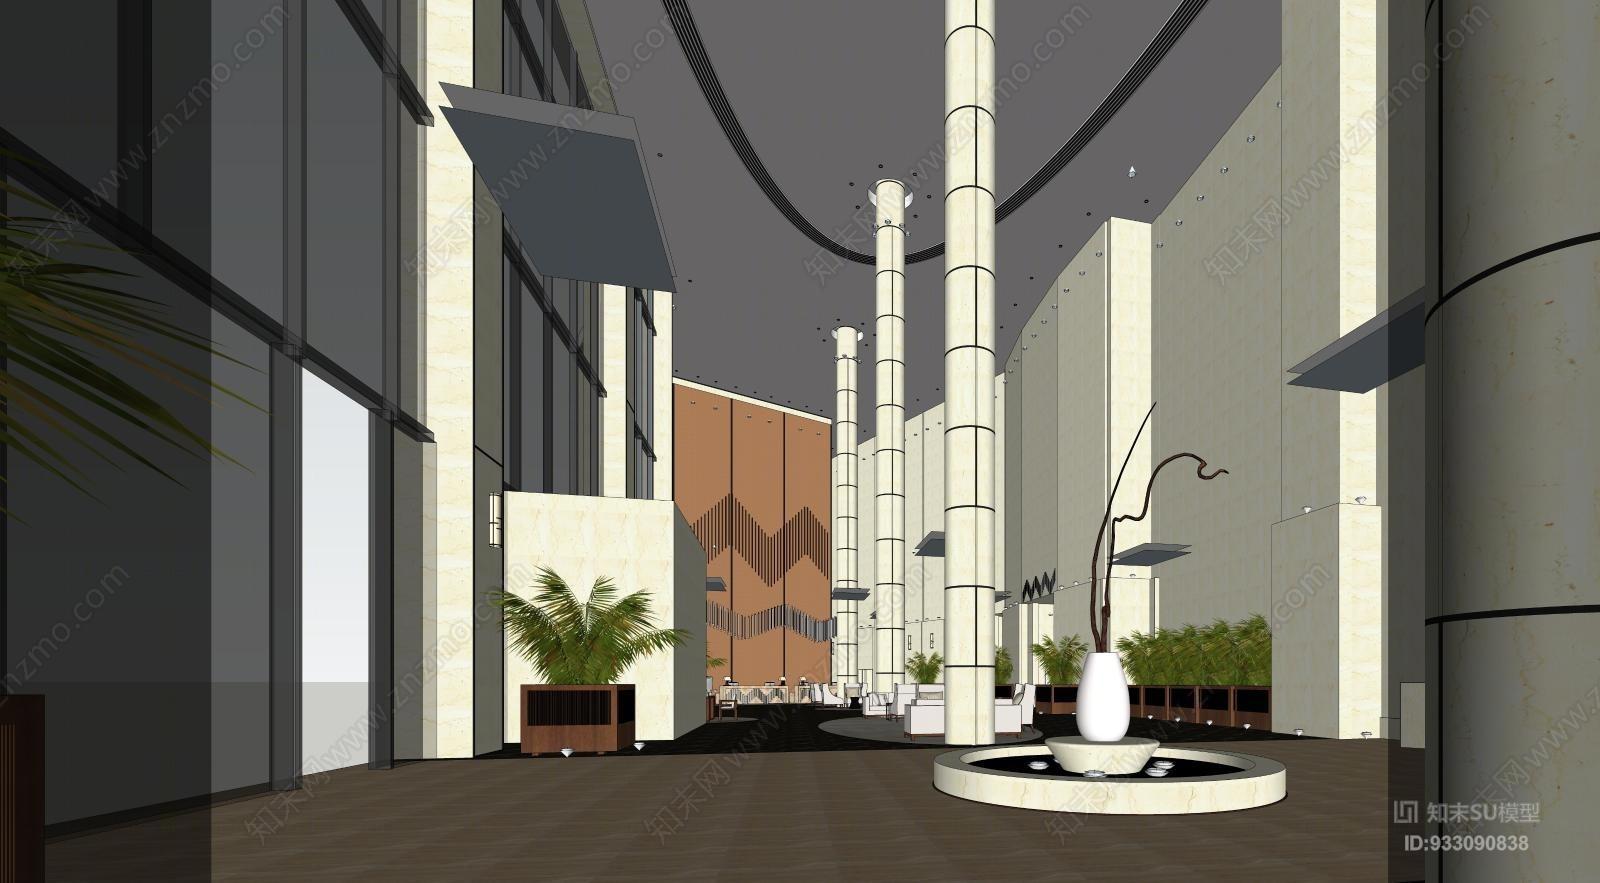 VRAY参数某五星级酒店室内大堂大厅前台休闲区沙发区入口景观